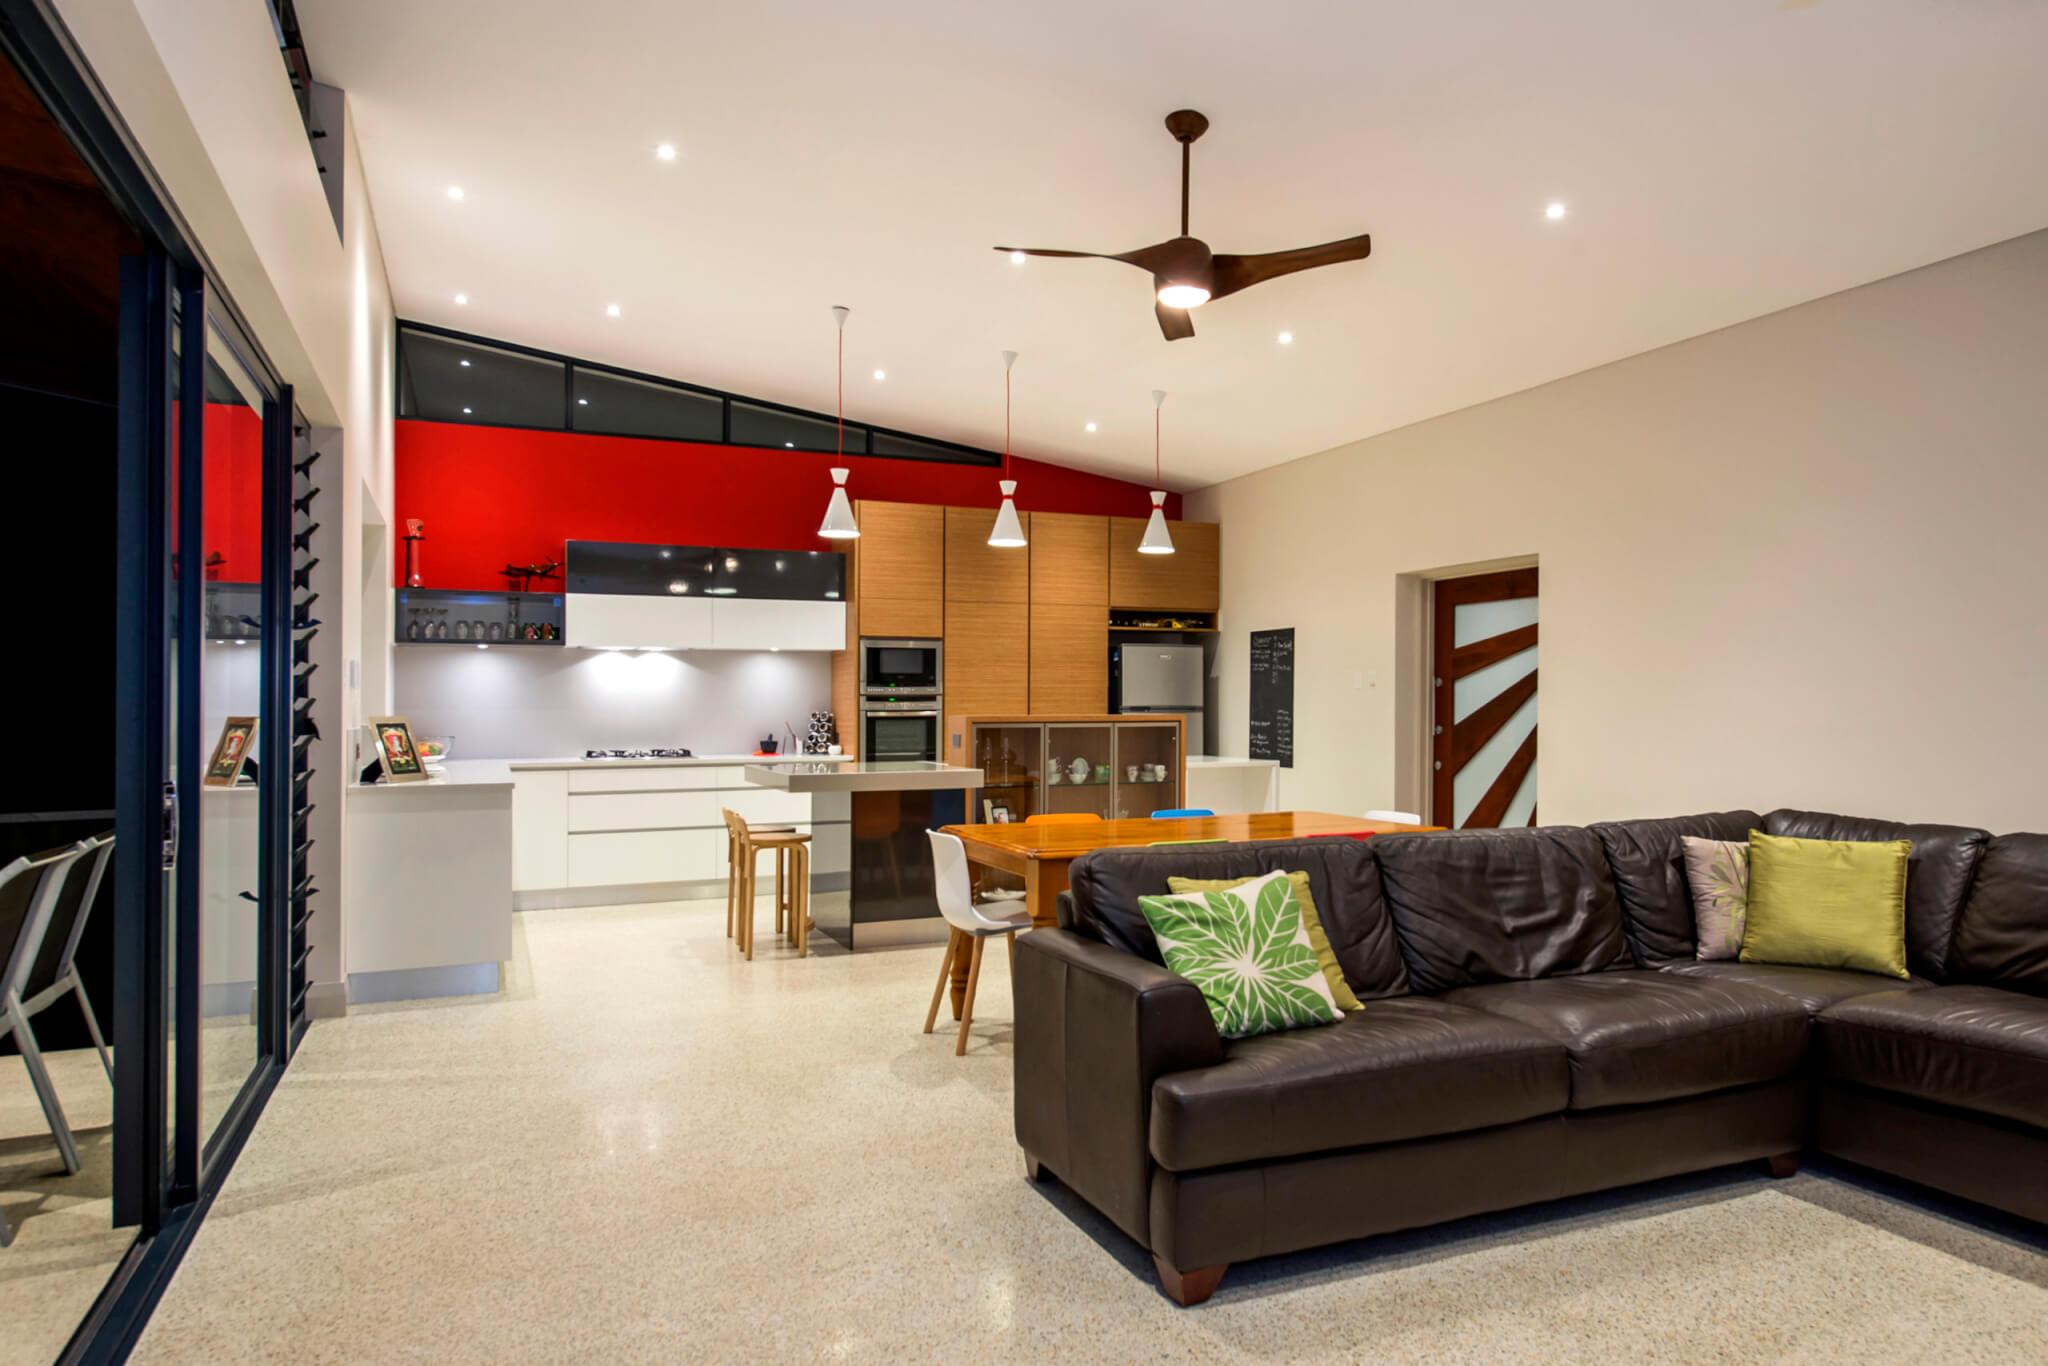 StJames home renovation